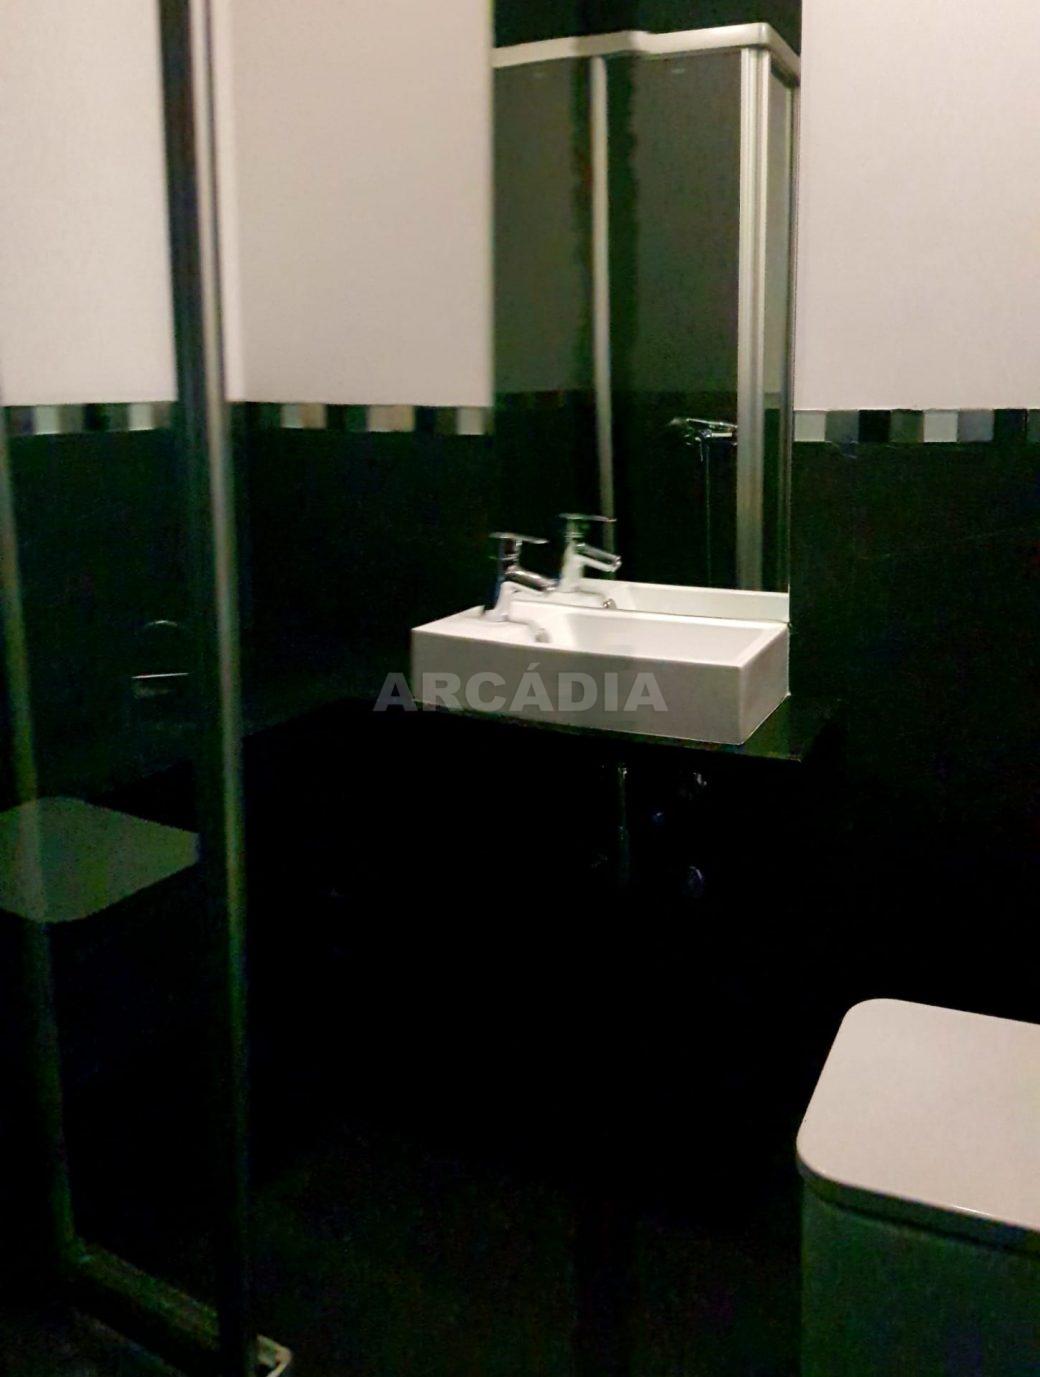 arcadia-imobiliaria-moradia-3665-520